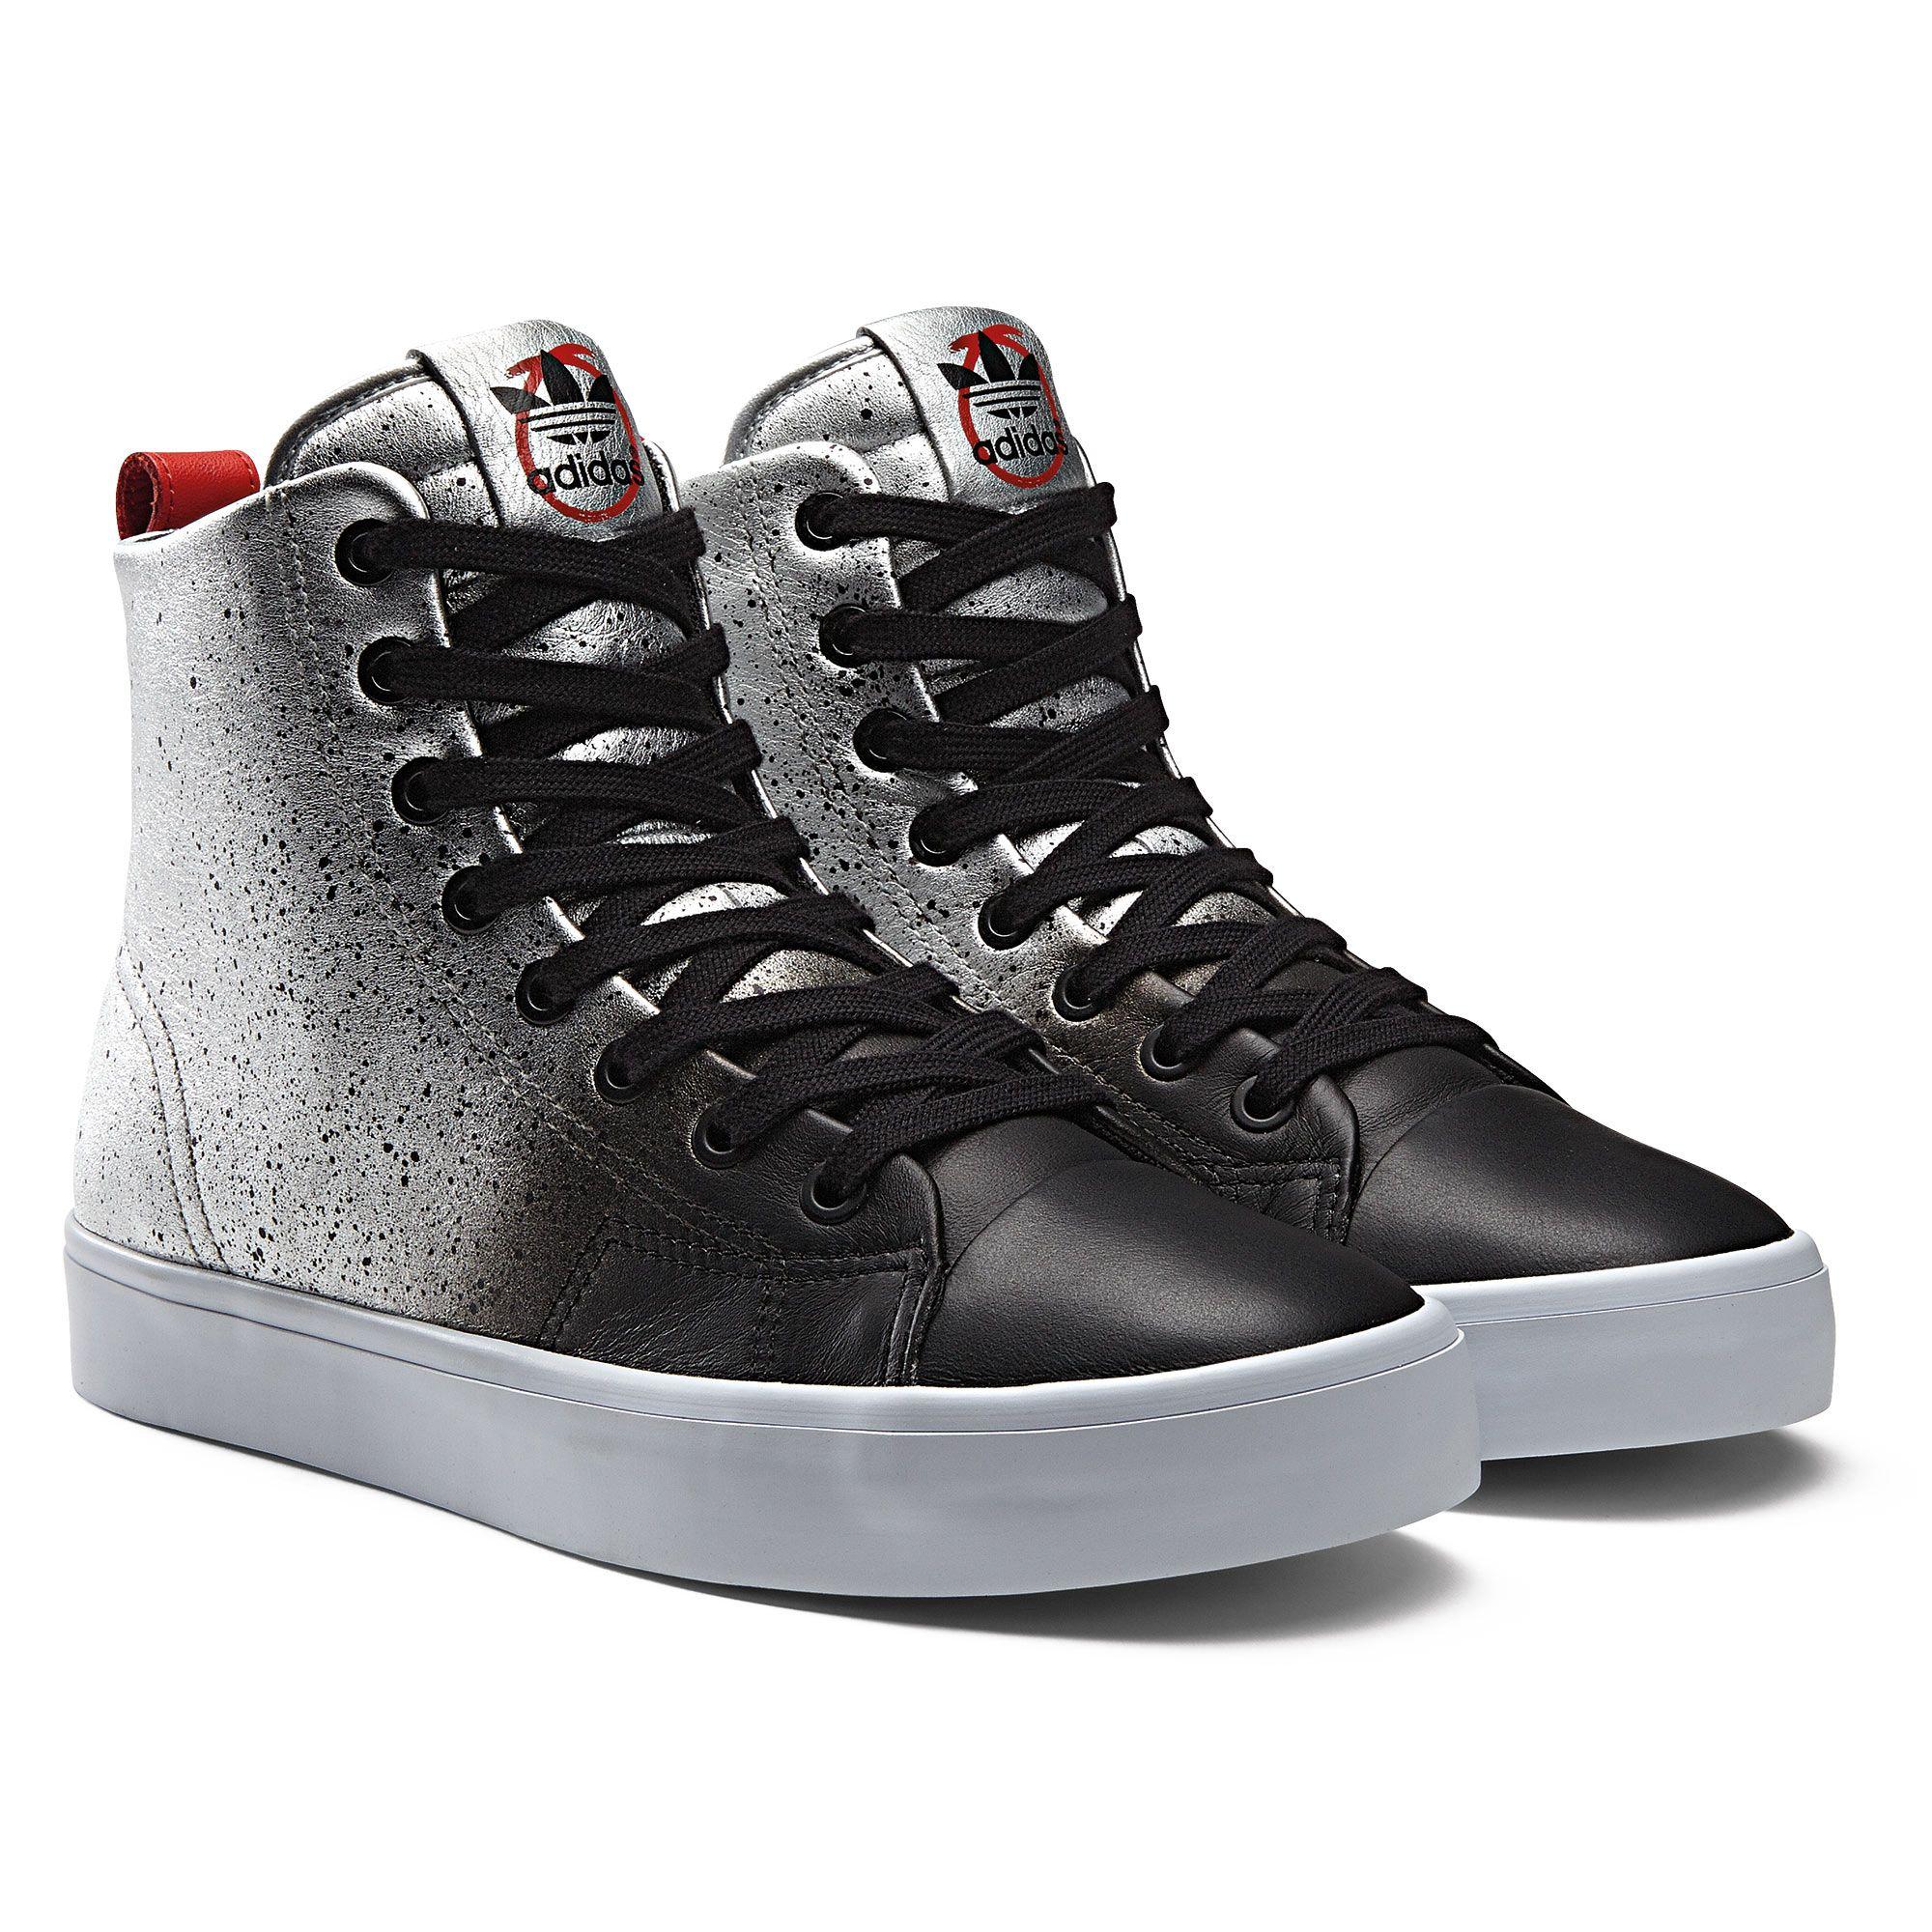 adidas Honey 2.0 Rita Ora Shoes | adidas US | Rock n Roll